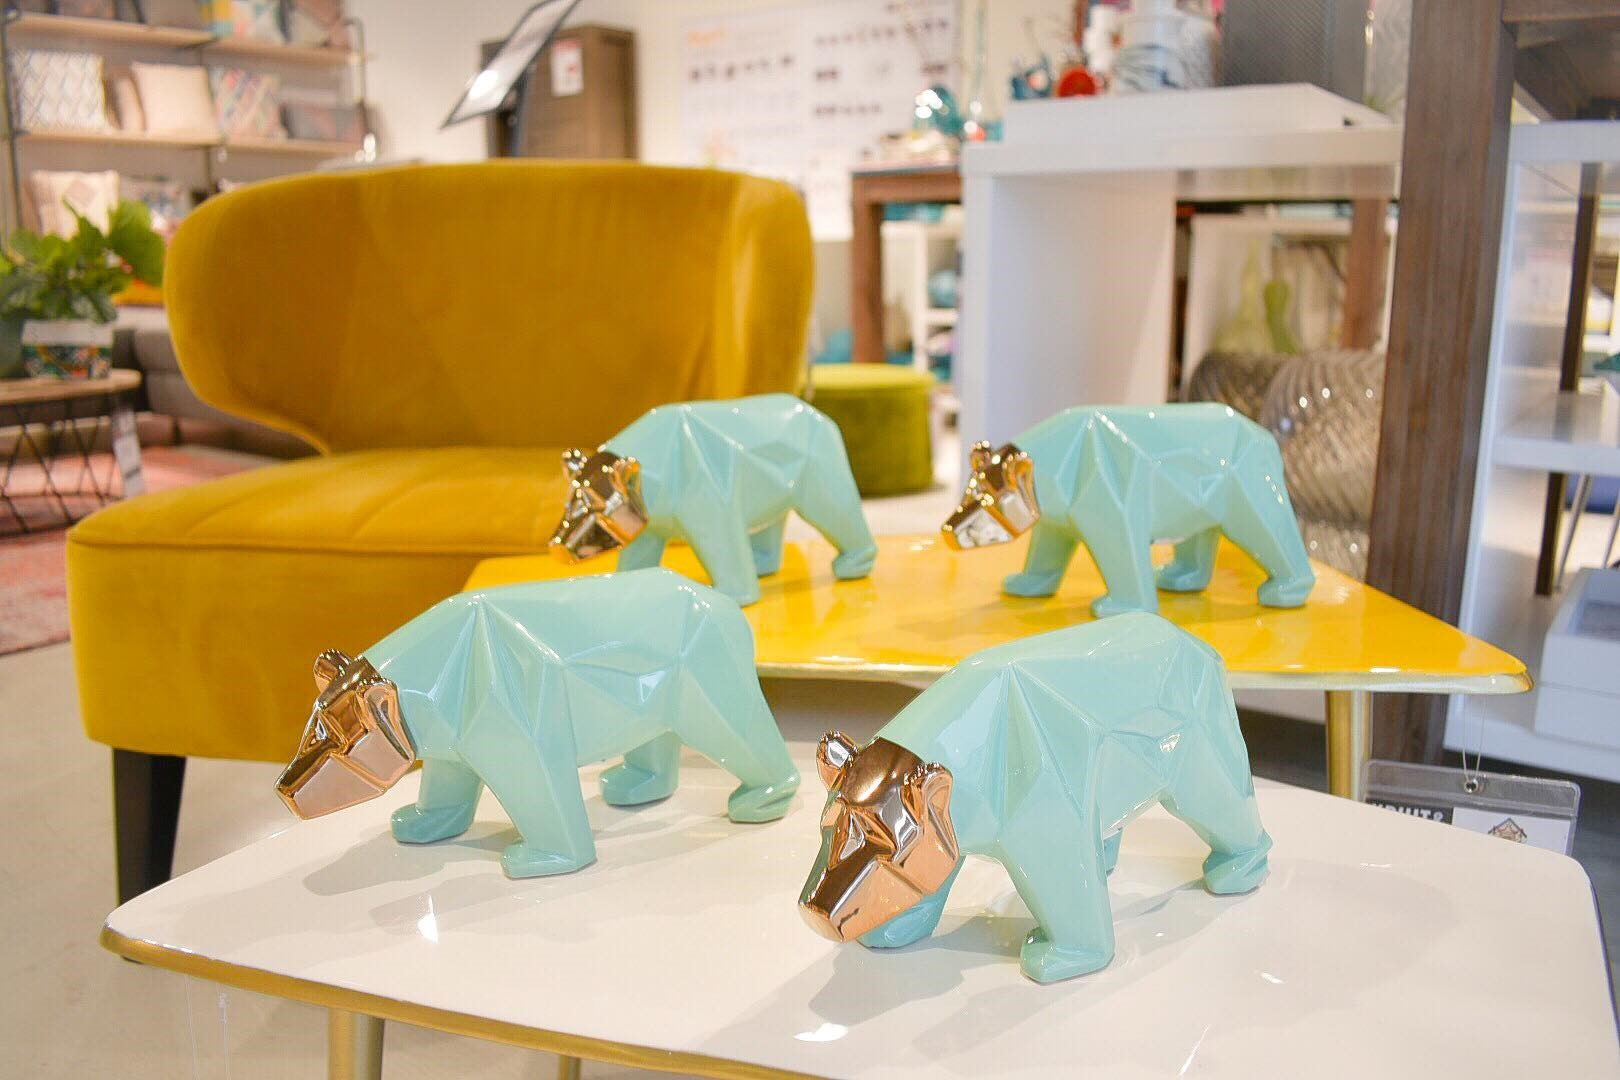 Decoratieve accessoires bij Kruit&Kramer!